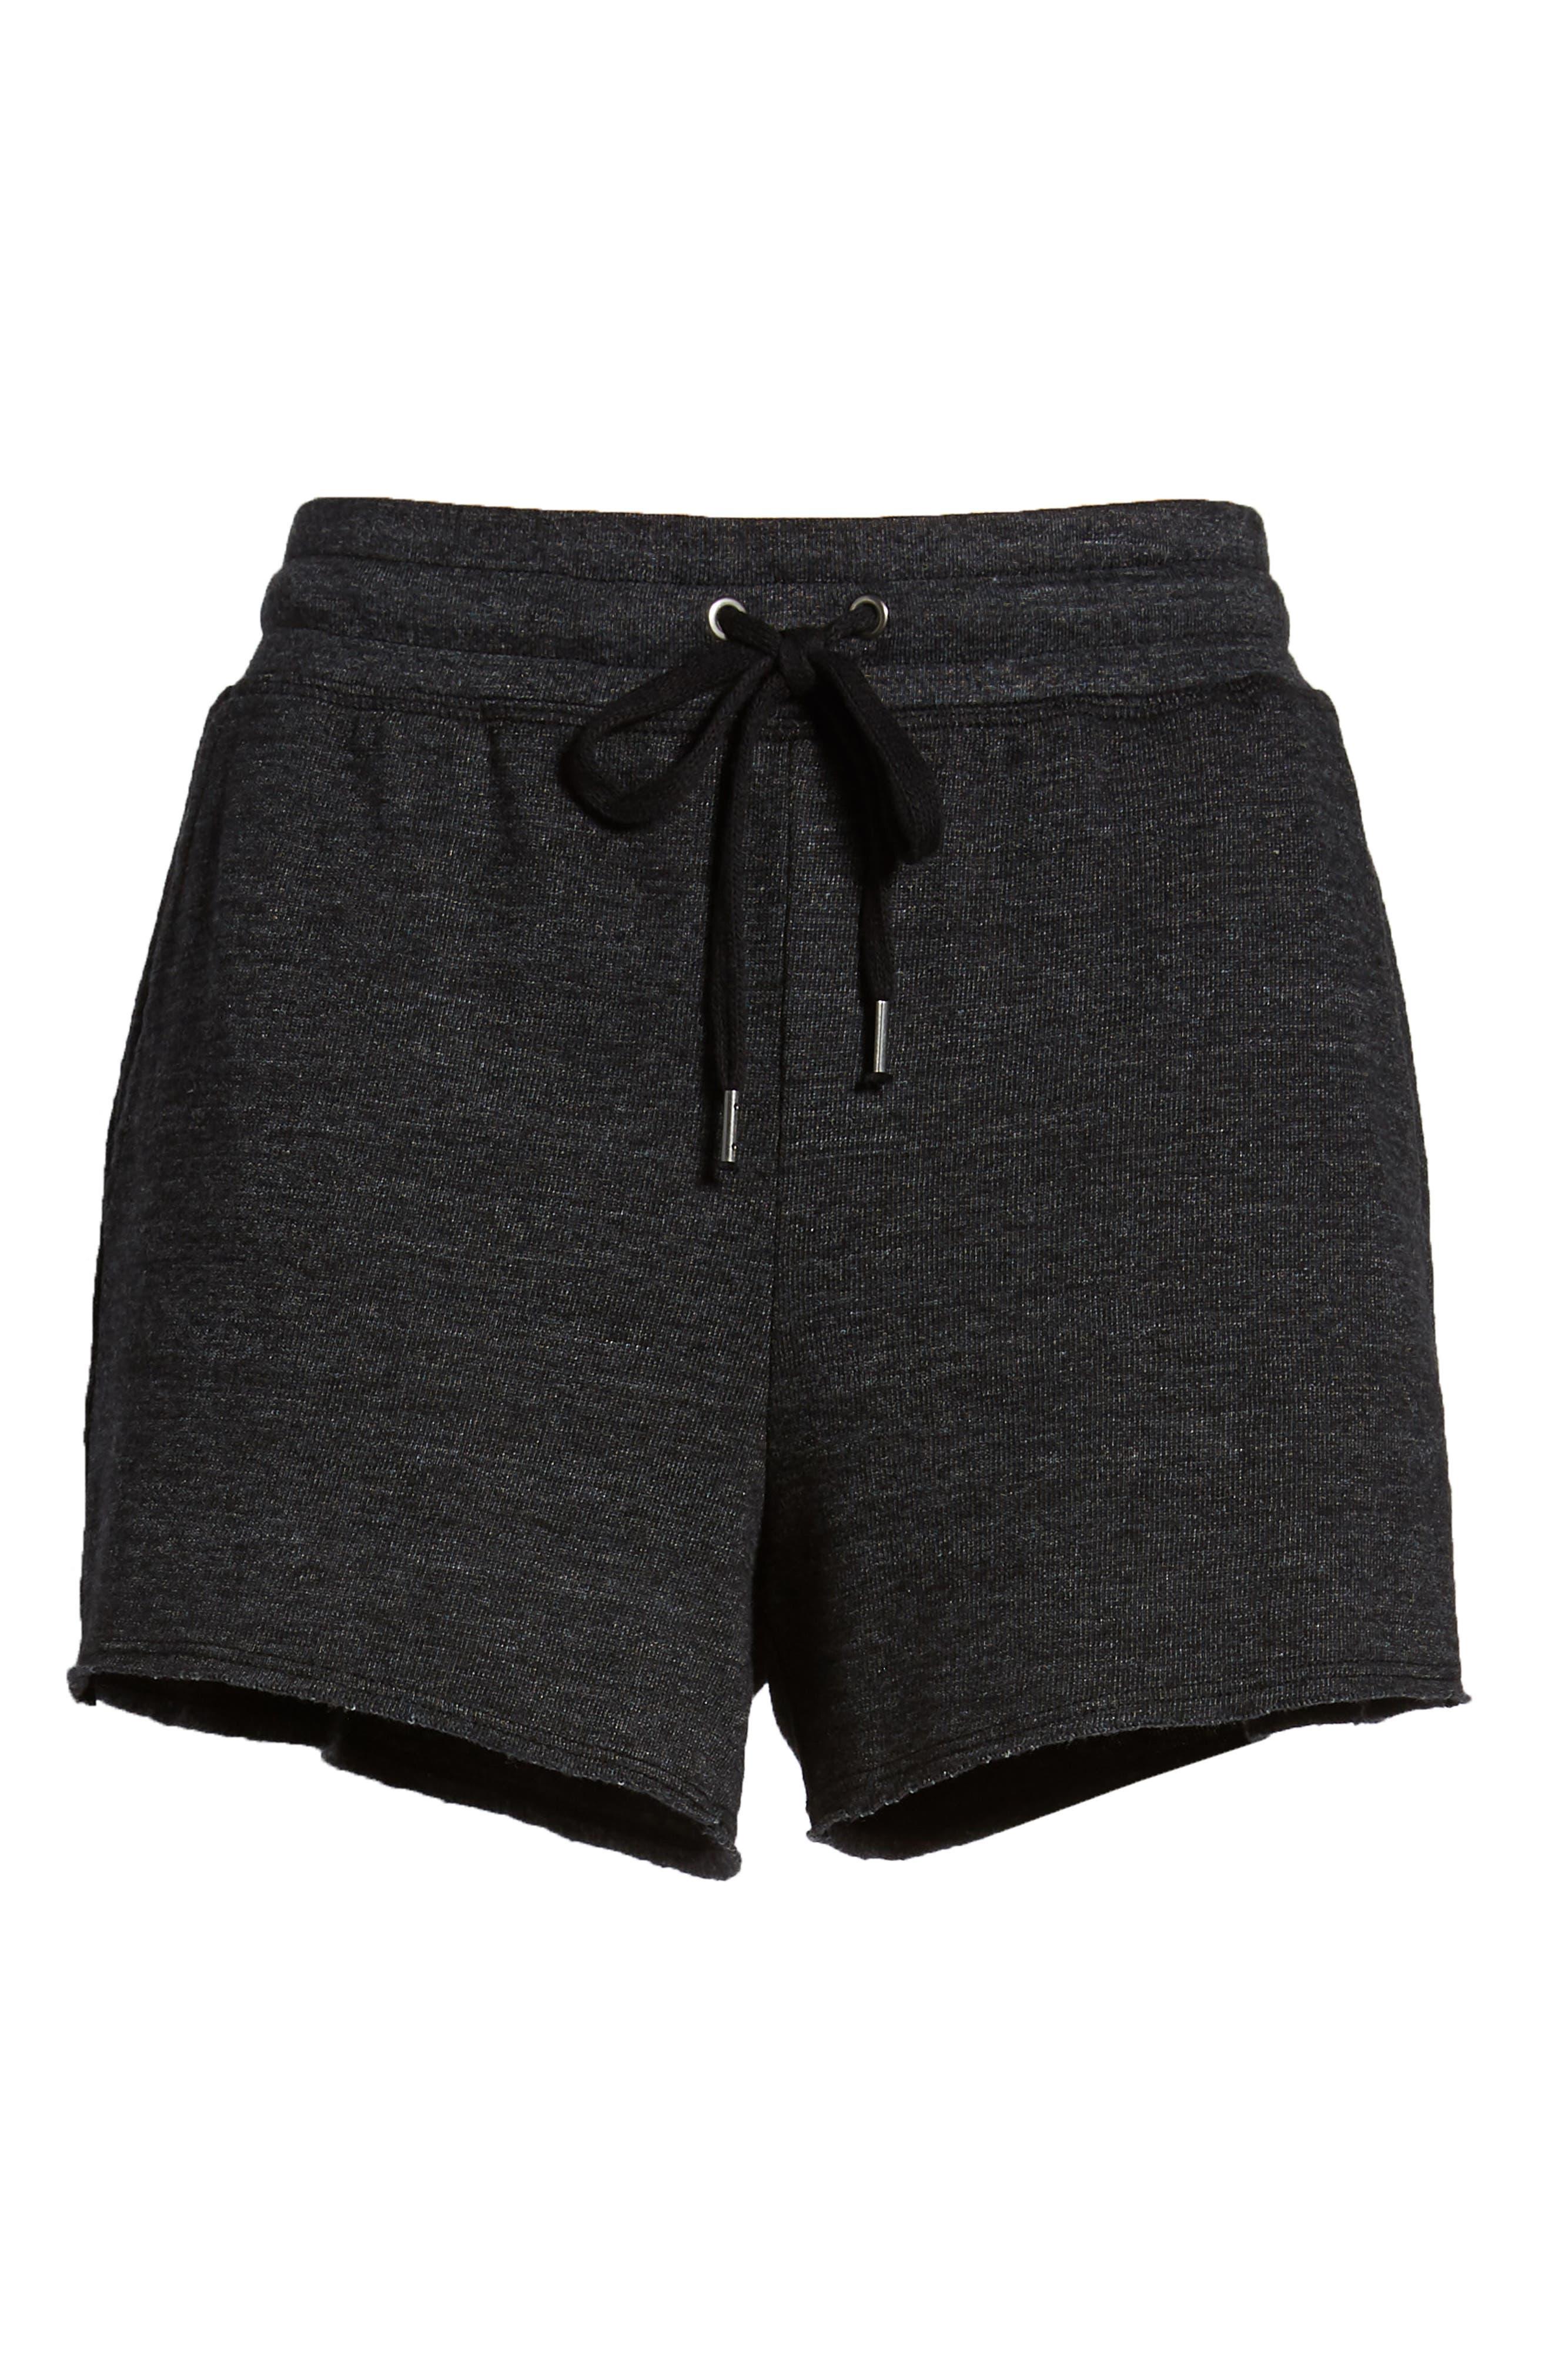 Active Shorts,                             Alternate thumbnail 6, color,                             001